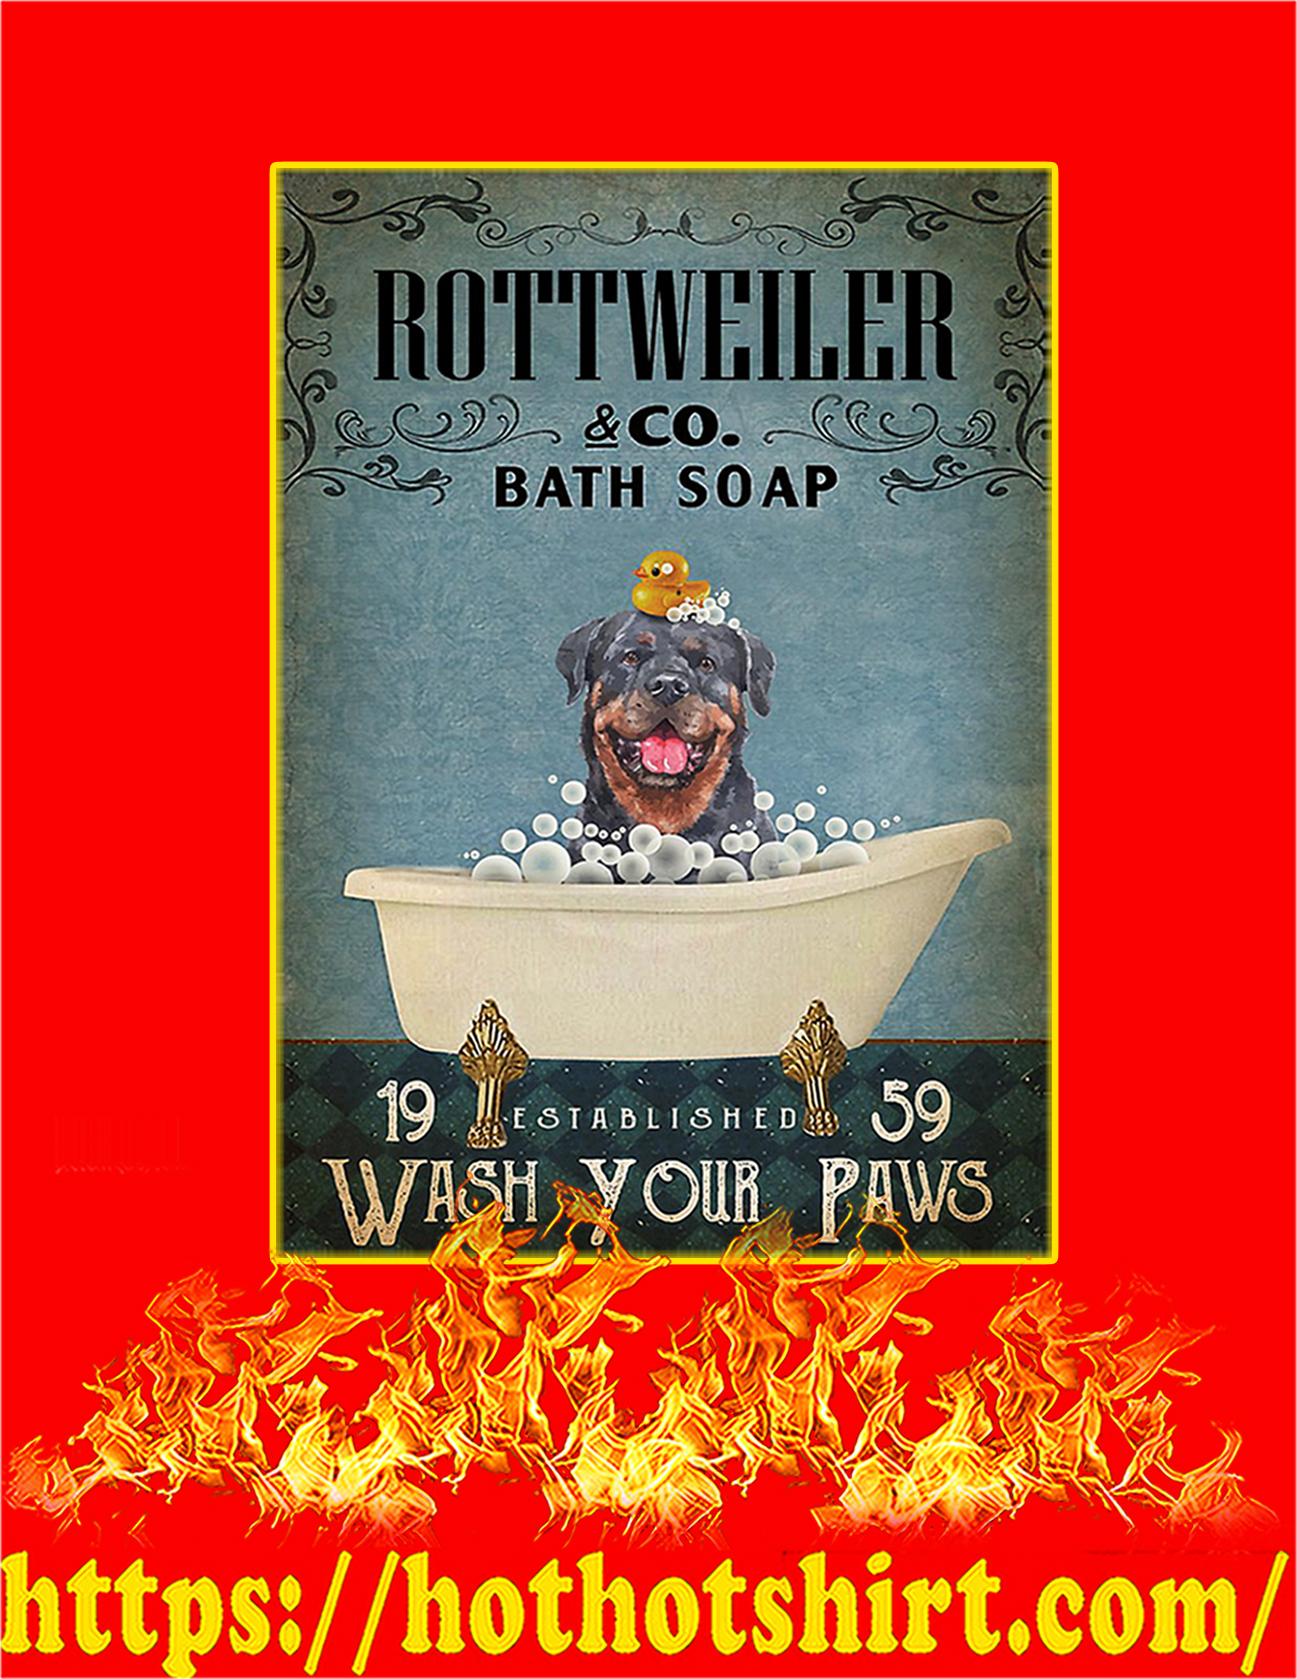 Bath soap company rottweiler poster - A3